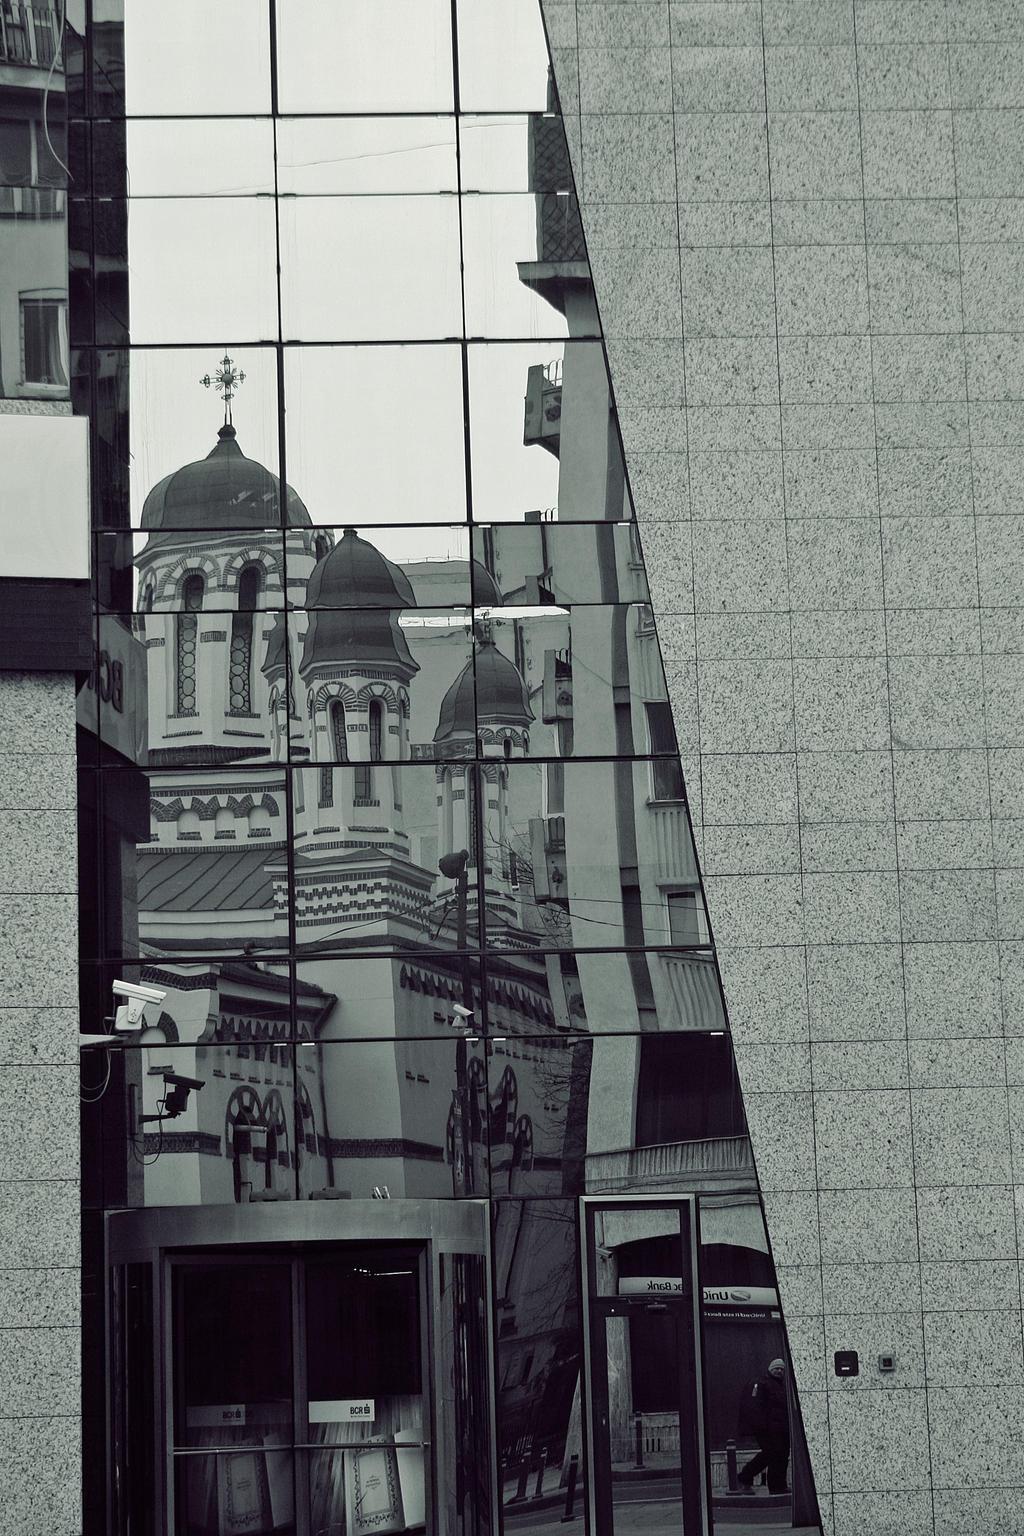 Gray City by VasiDgallery